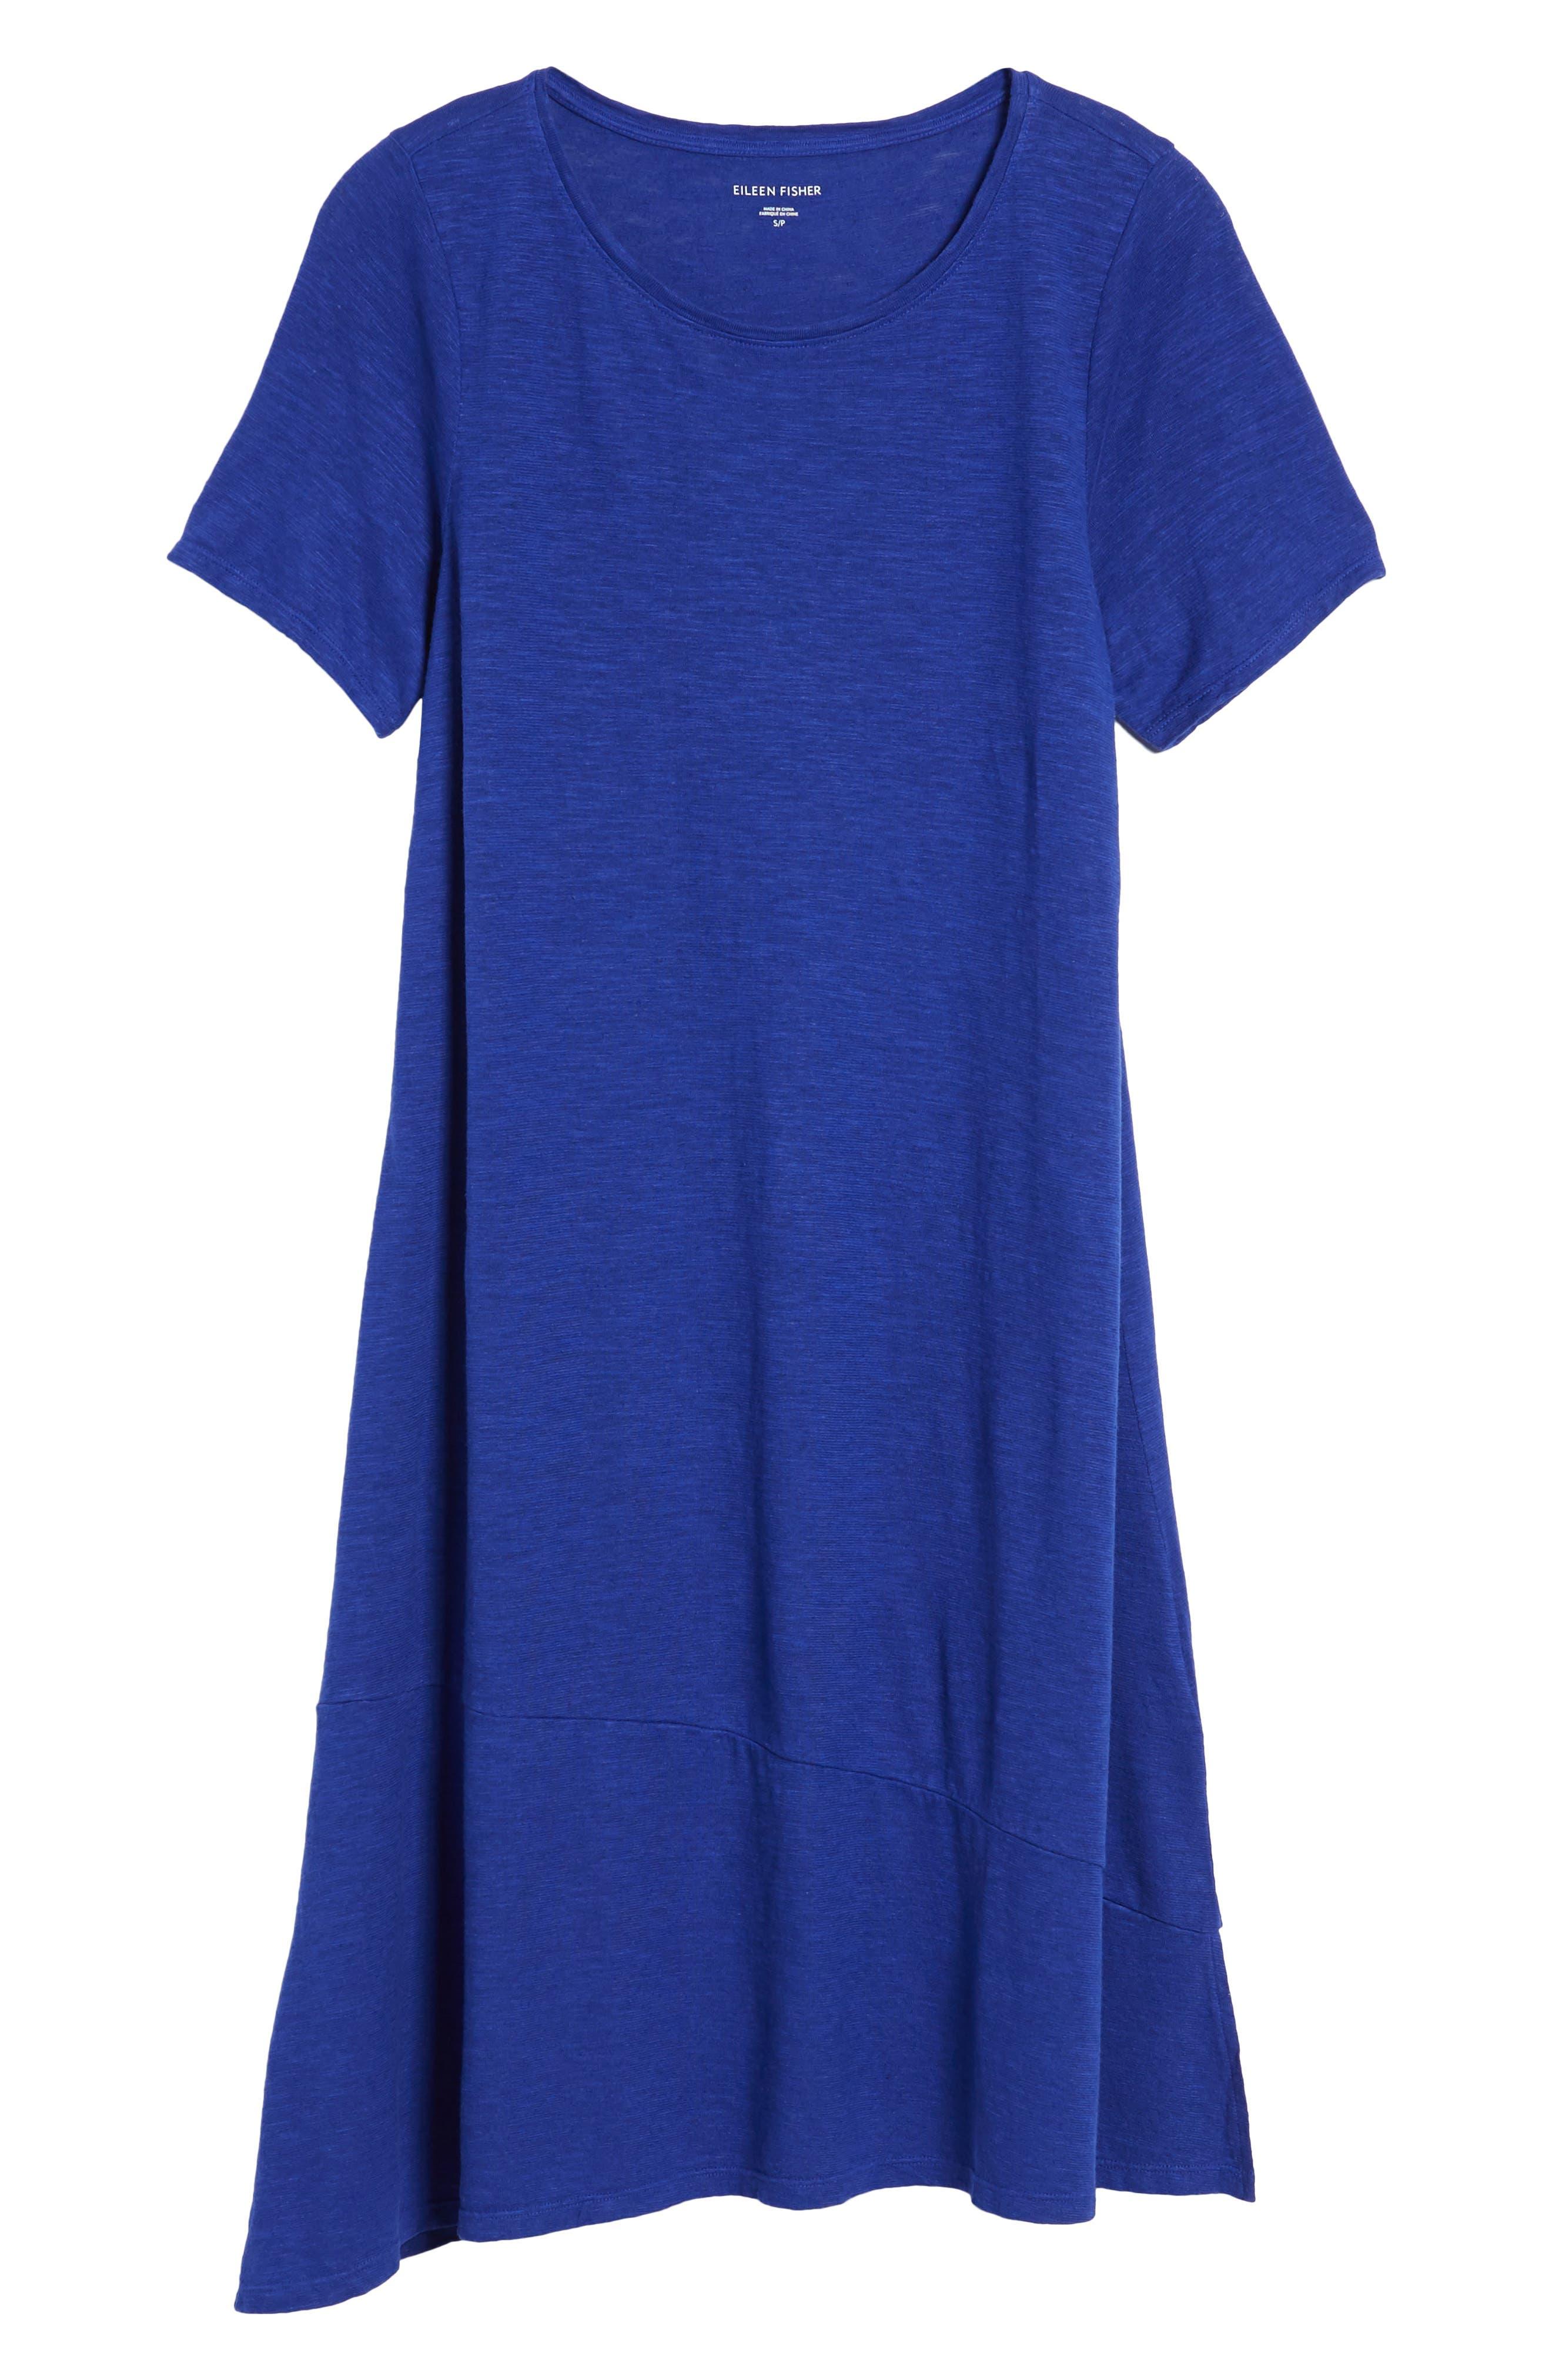 Asymmetrical Hemp Blend Shift Dress,                             Alternate thumbnail 7, color,                             Blue Violet